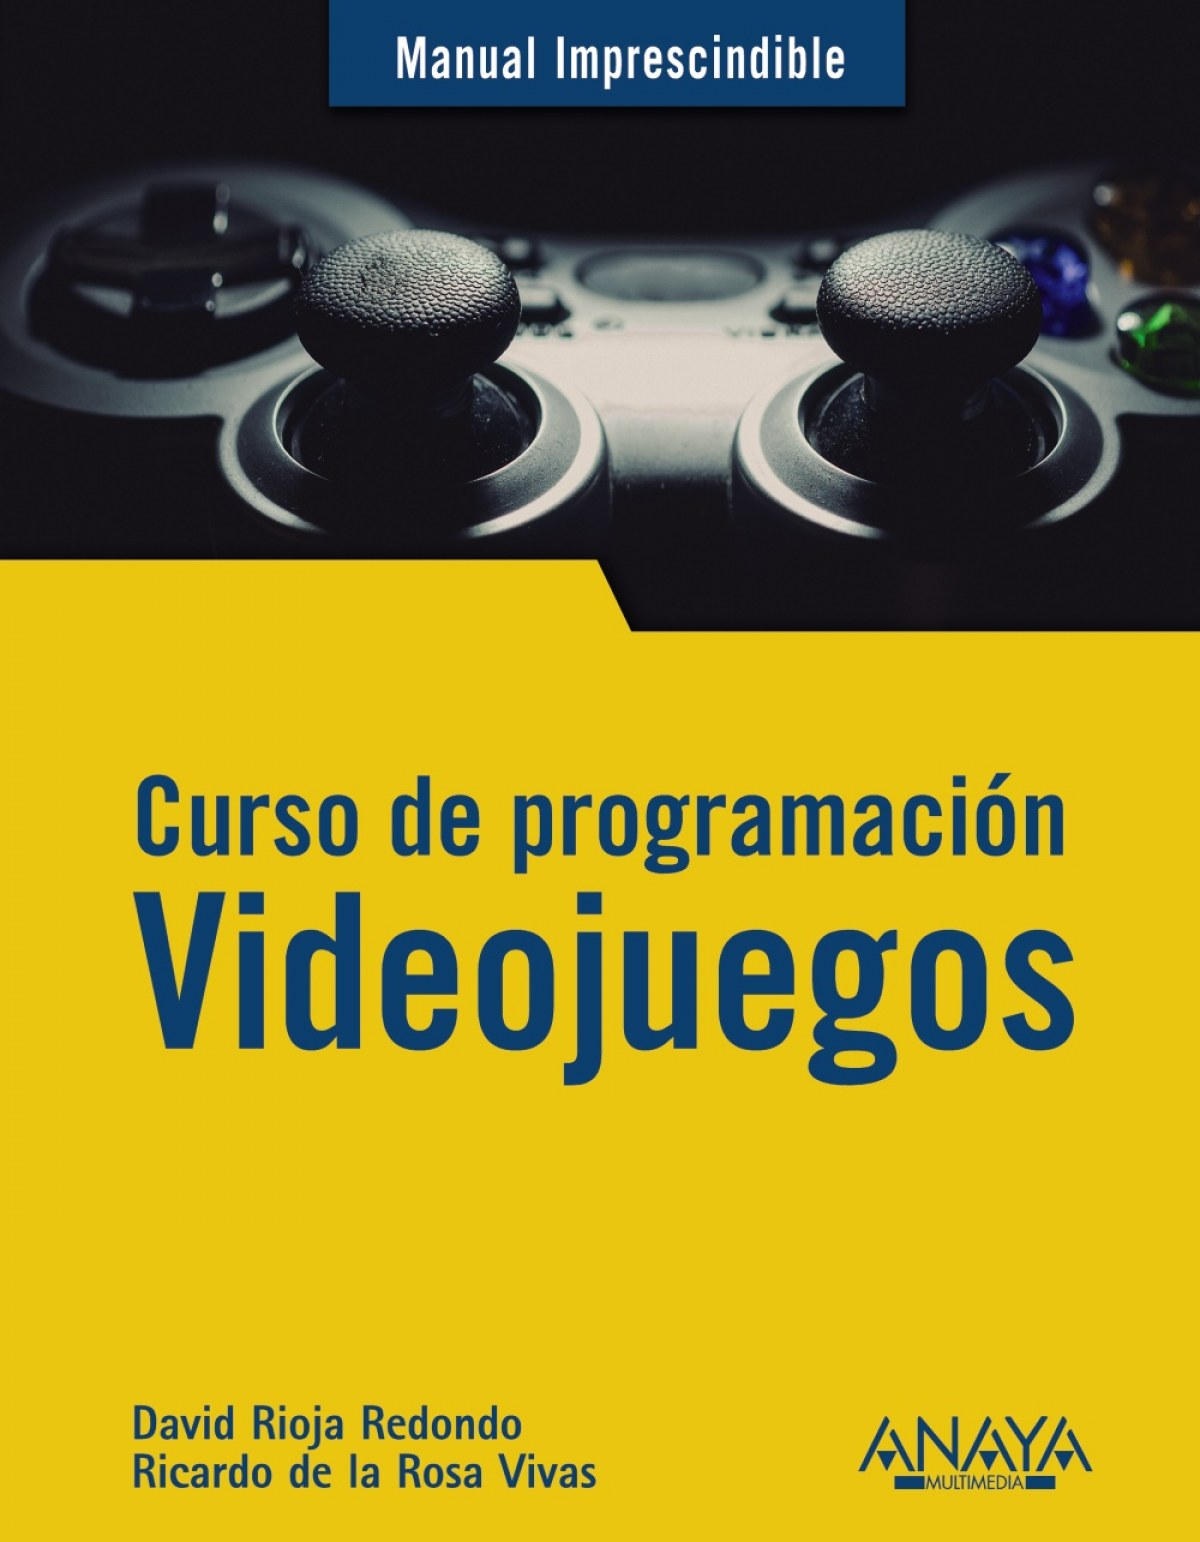 Curso de programación.Videojuegos 9788441542686